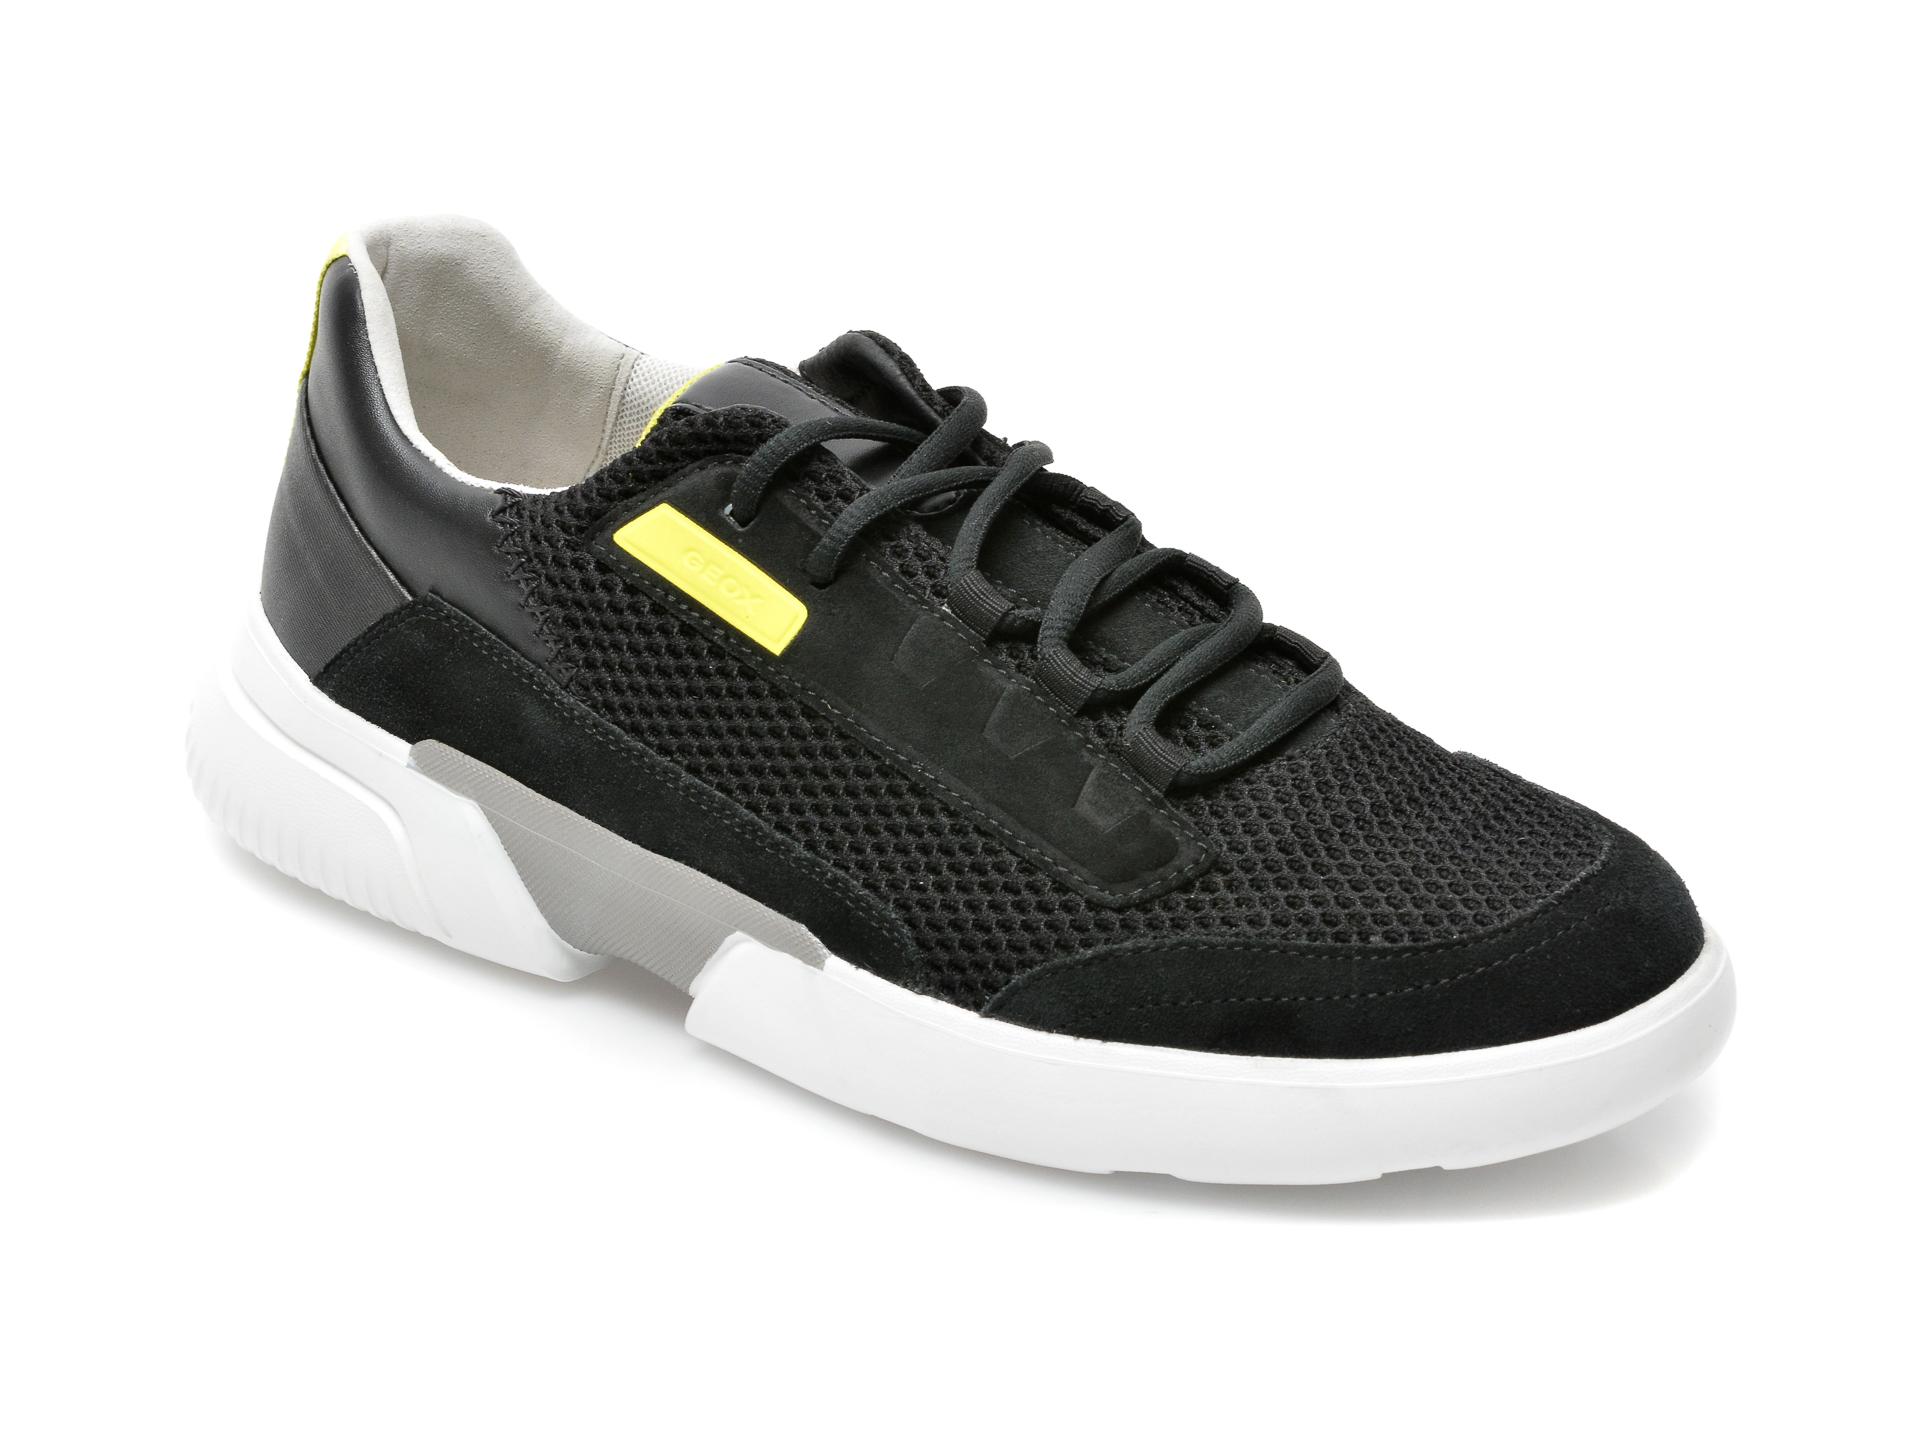 Pantofi sport GEOX negri, U15ATB, din piele naturala